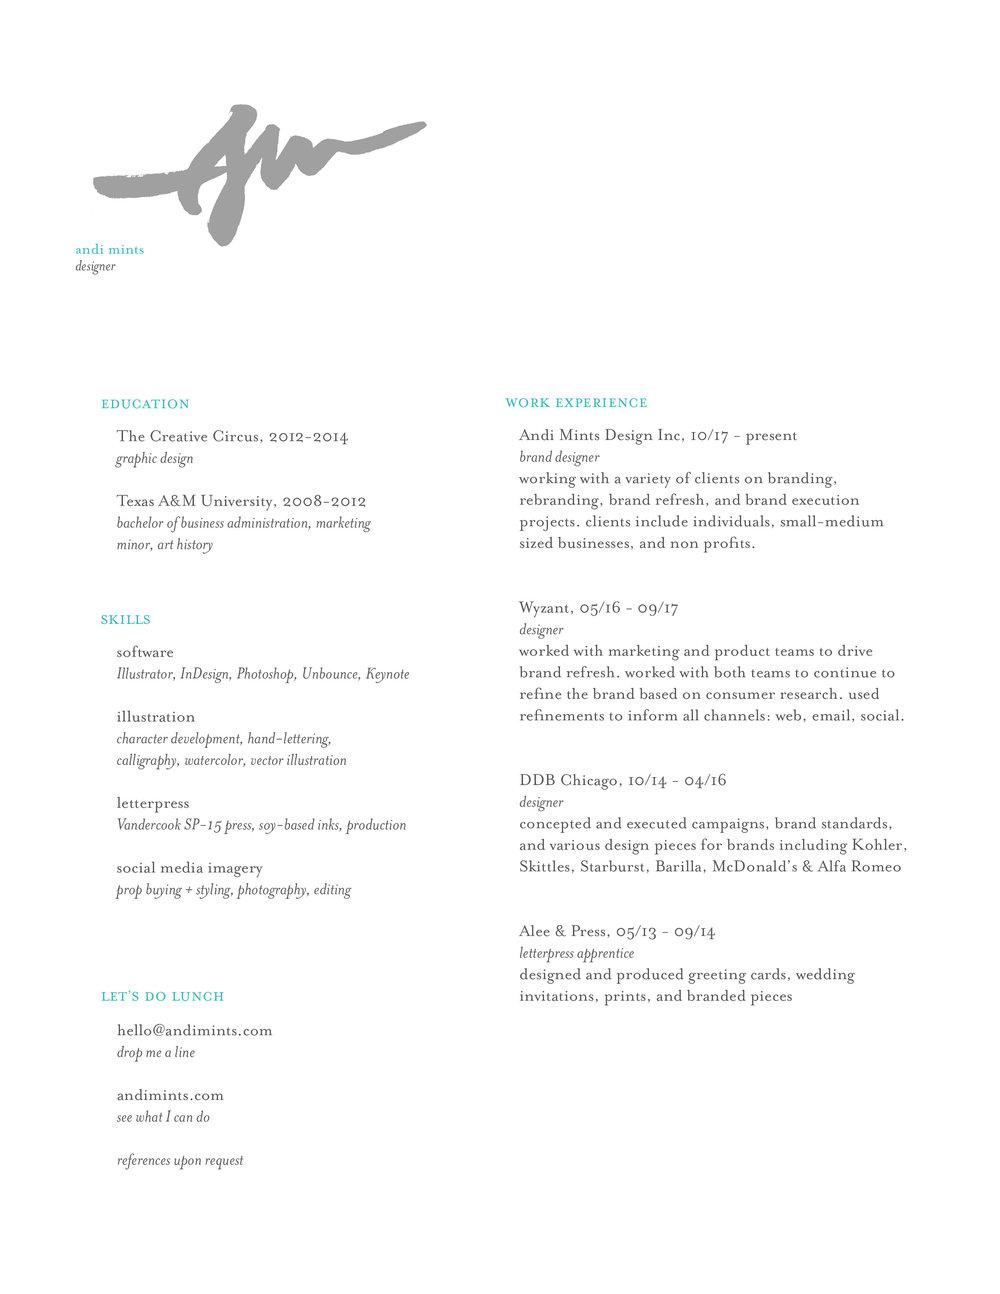 Andi Mints Designer Resume